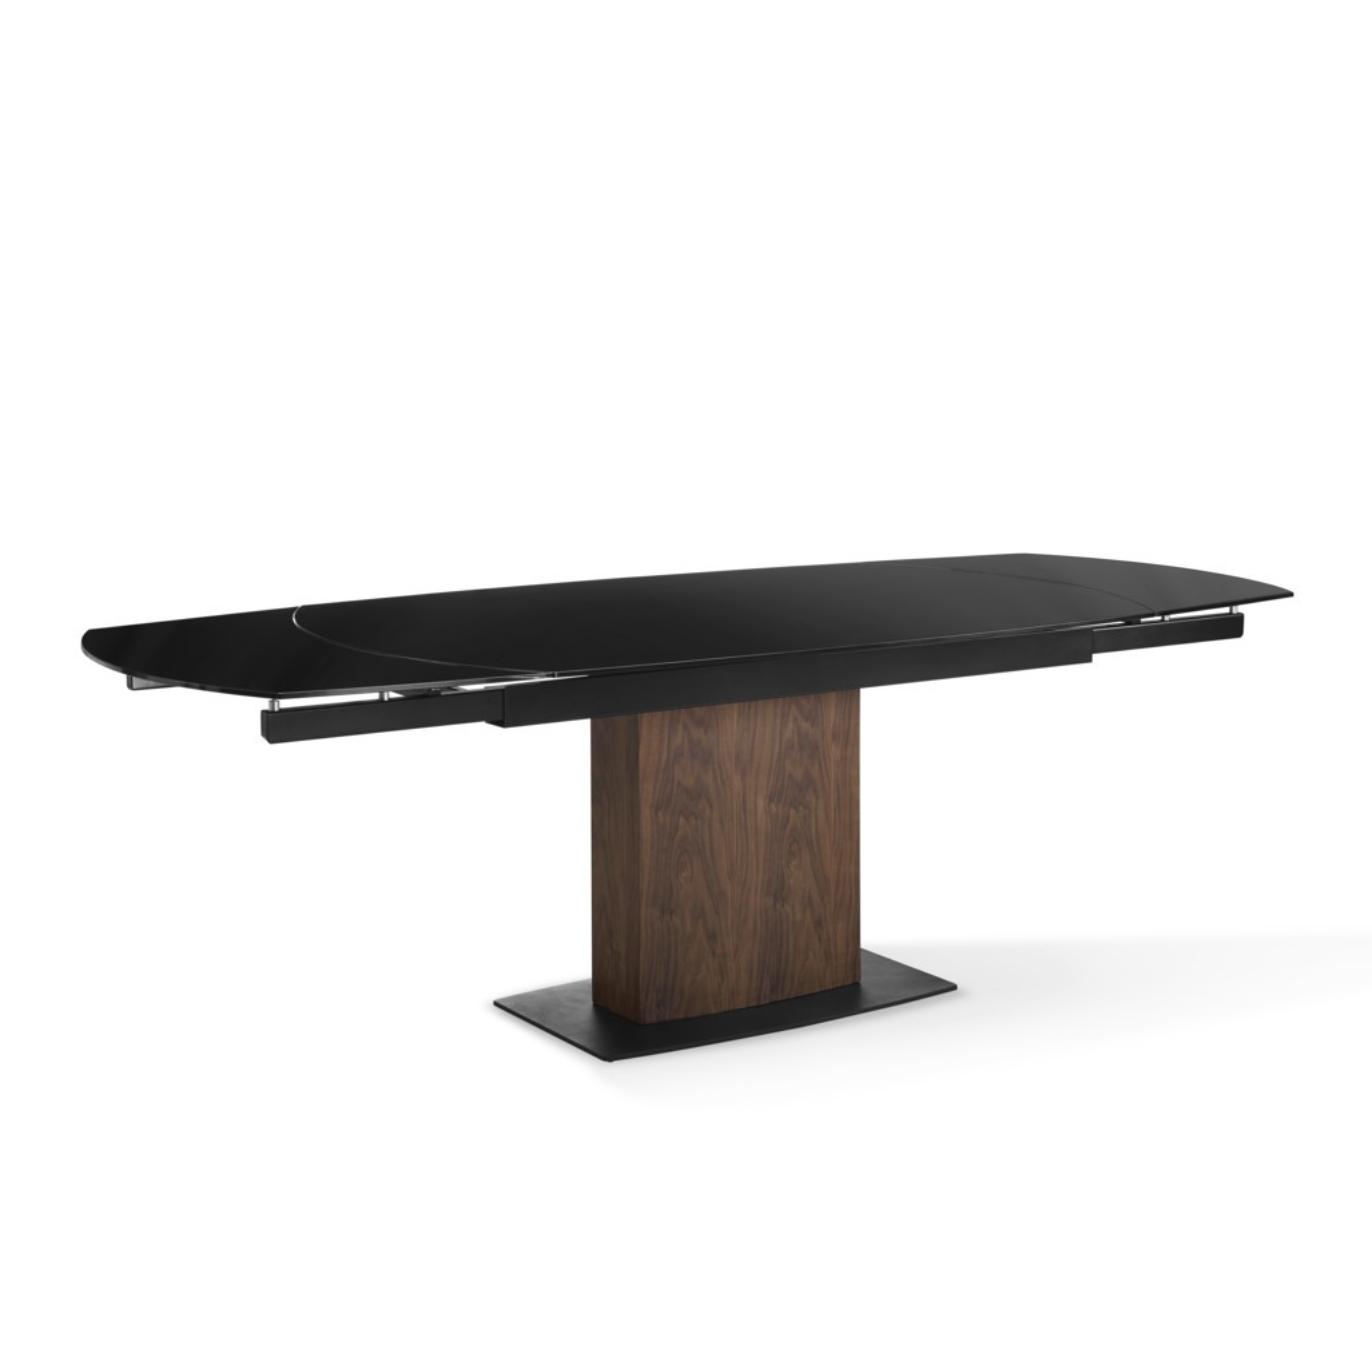 parker tablecreative, creative furniture usa, creative dining